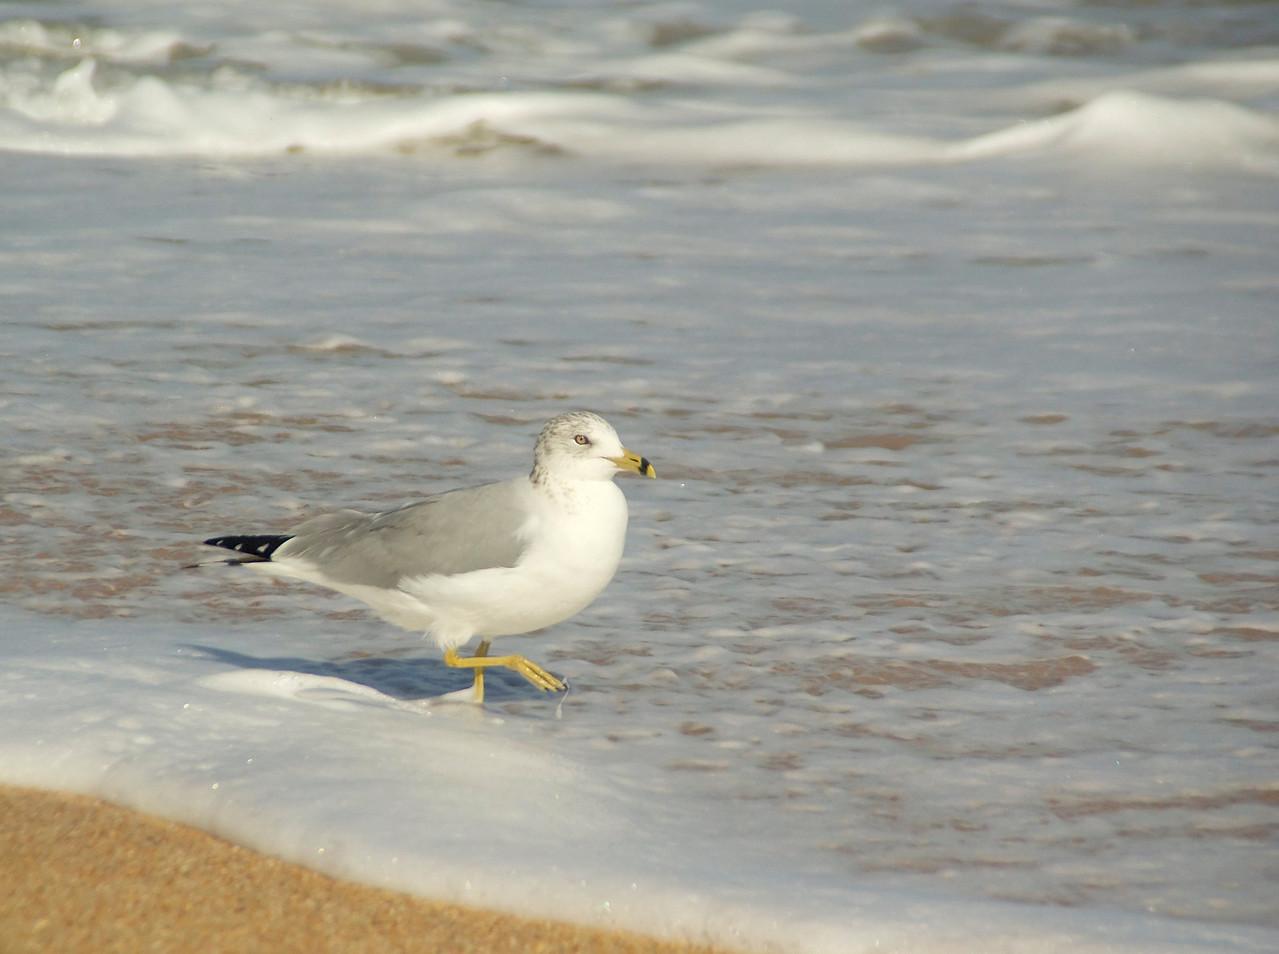 Hammock beach0123